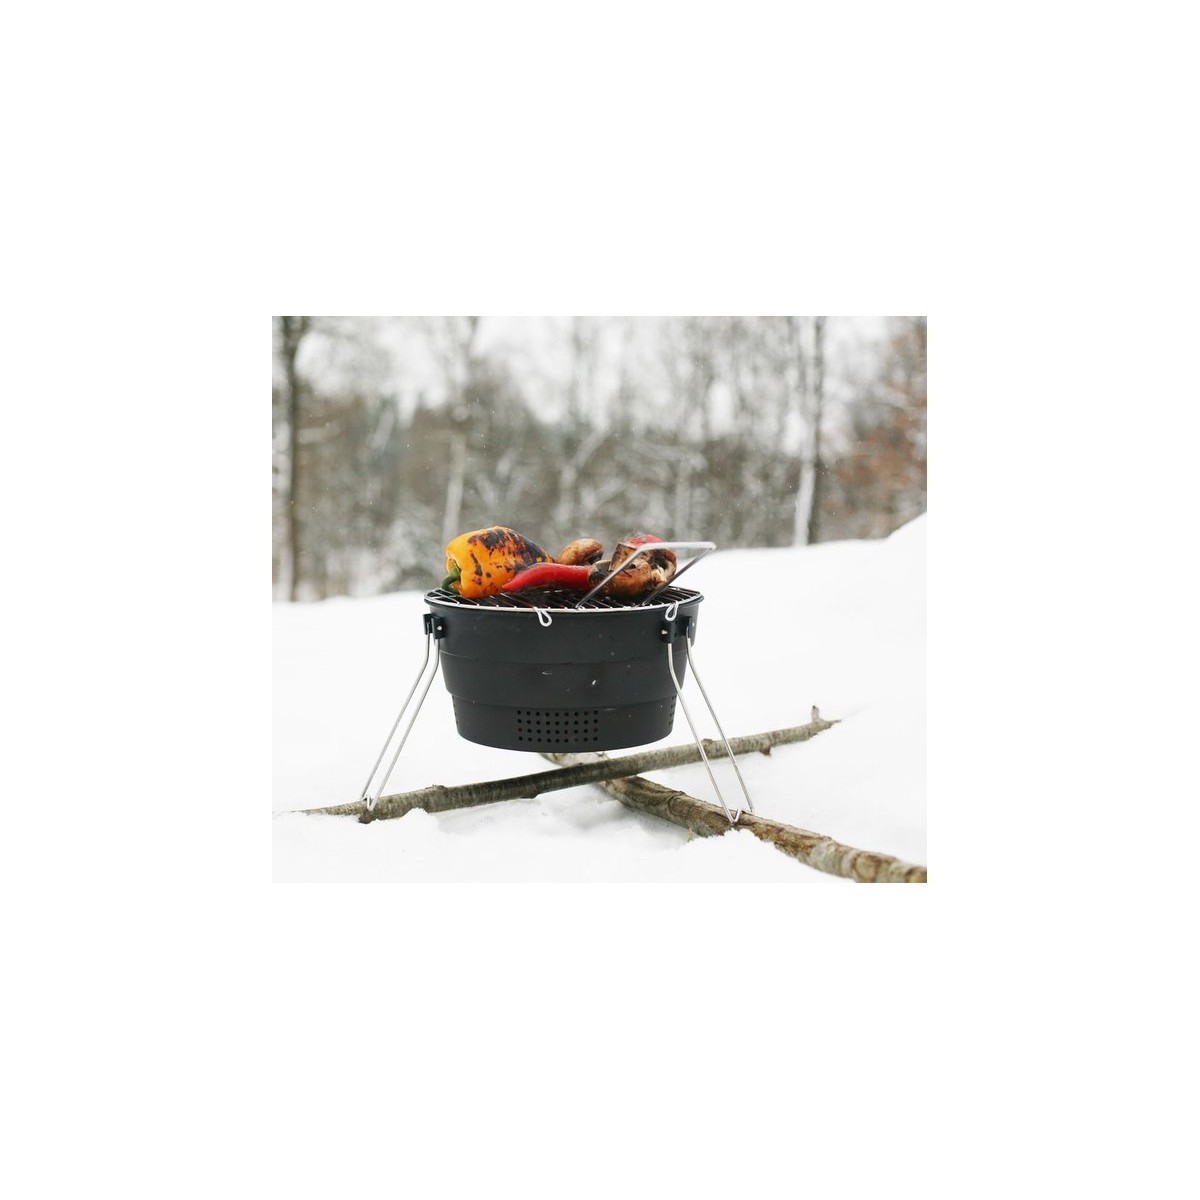 pop up grill barbecue pliable et portatif de bivouac bivouac camping inuka. Black Bedroom Furniture Sets. Home Design Ideas